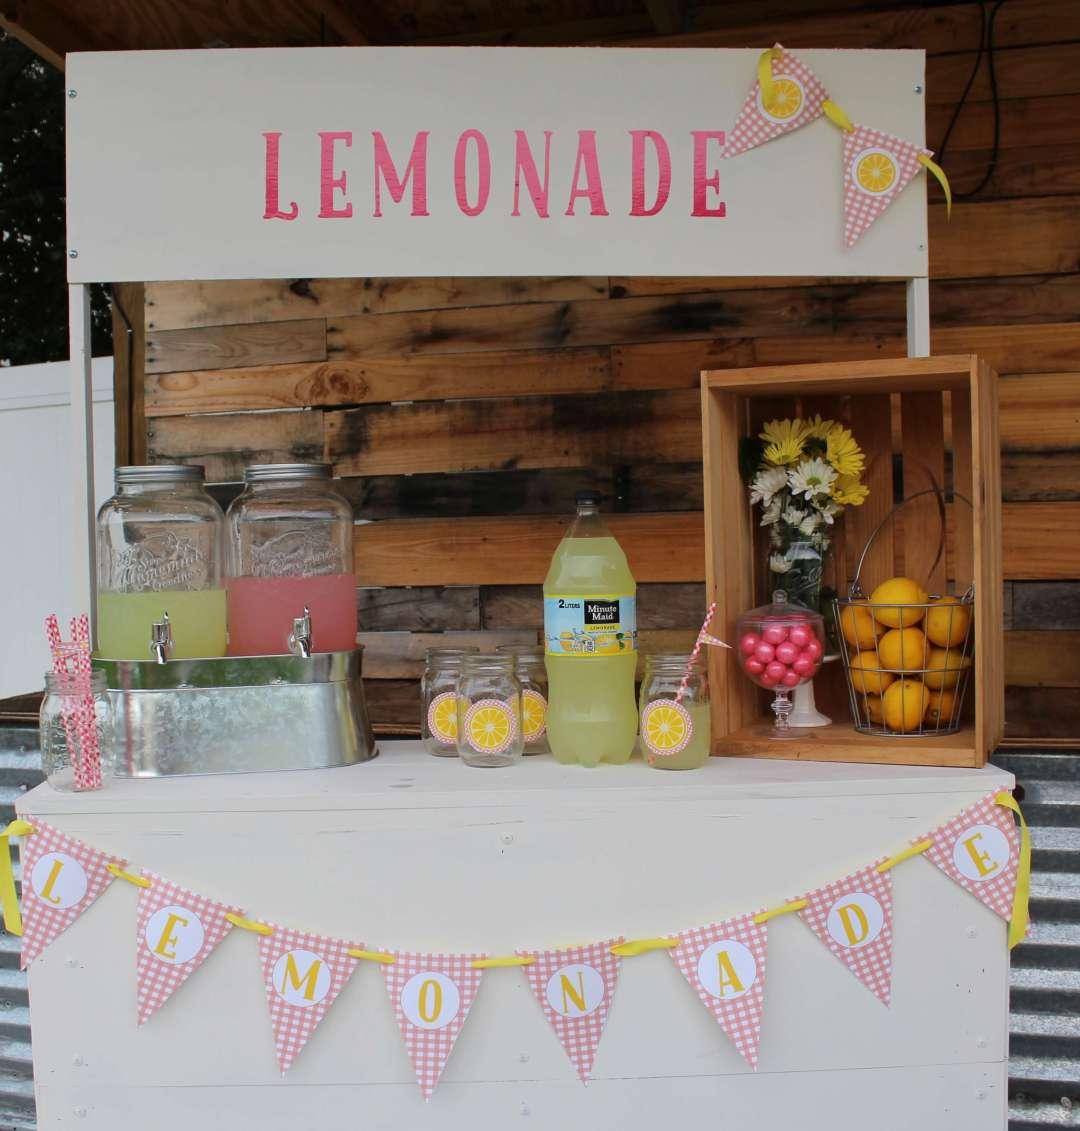 Lemonade Stand, Lemon Ice Recipe, Party, Free Printables, Lemonade, Everyday Party Magazine